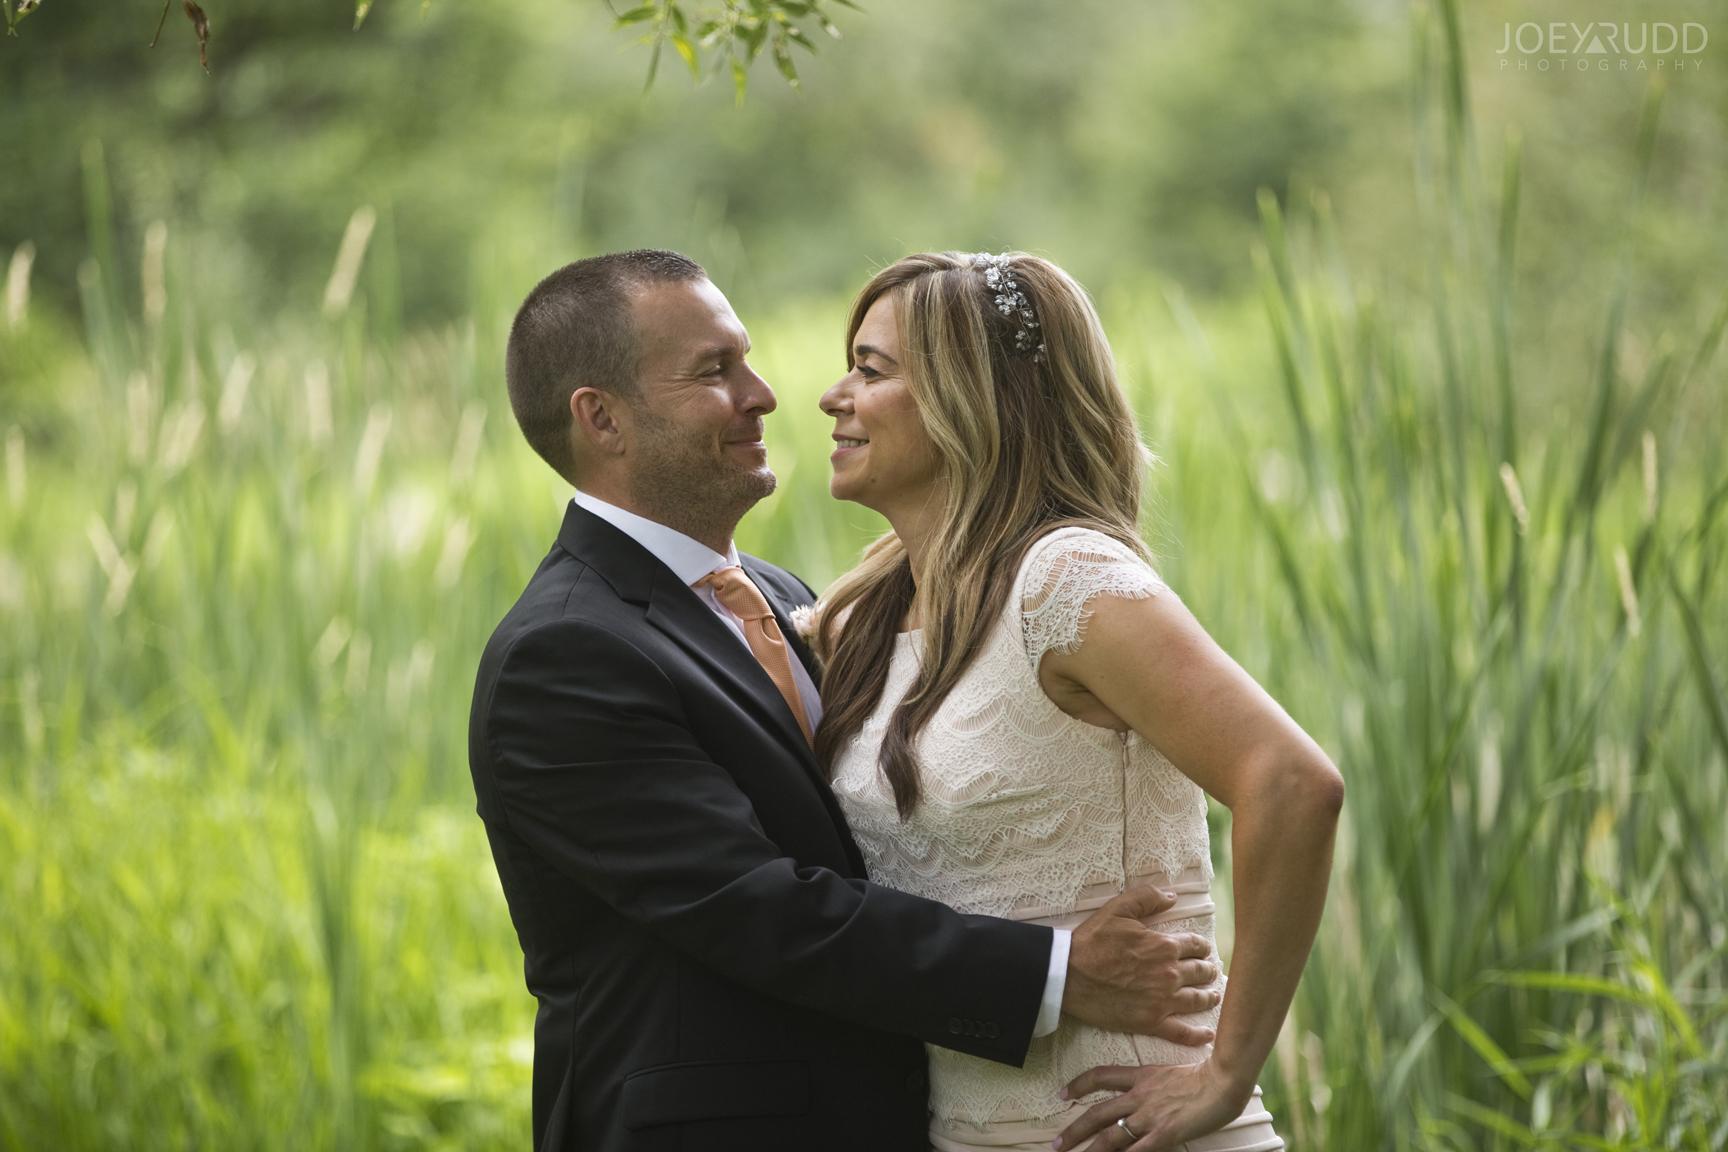 Elopement Wedding by Ottawa Wedding Photographer Joey Rudd Photography Arboretum Swamp